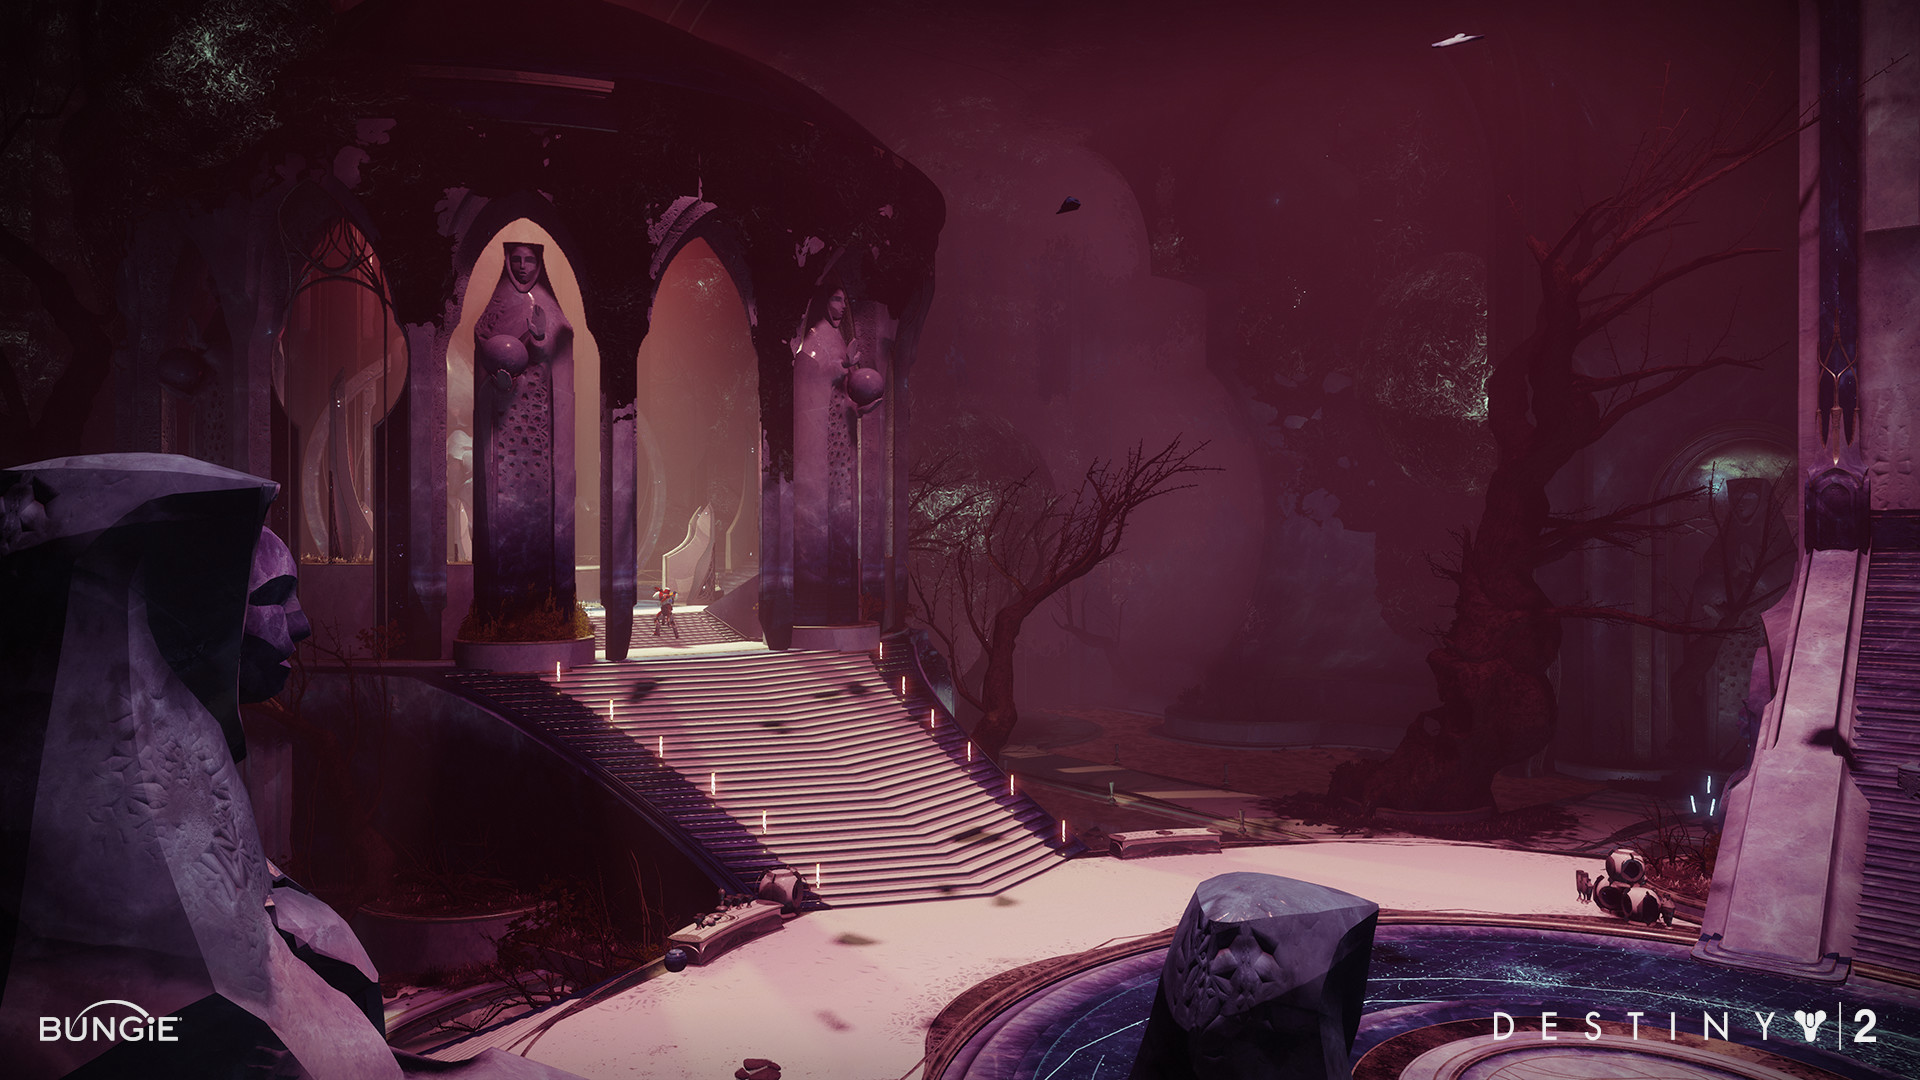 Destiny 2 Last Wish Artwork | True Gaming